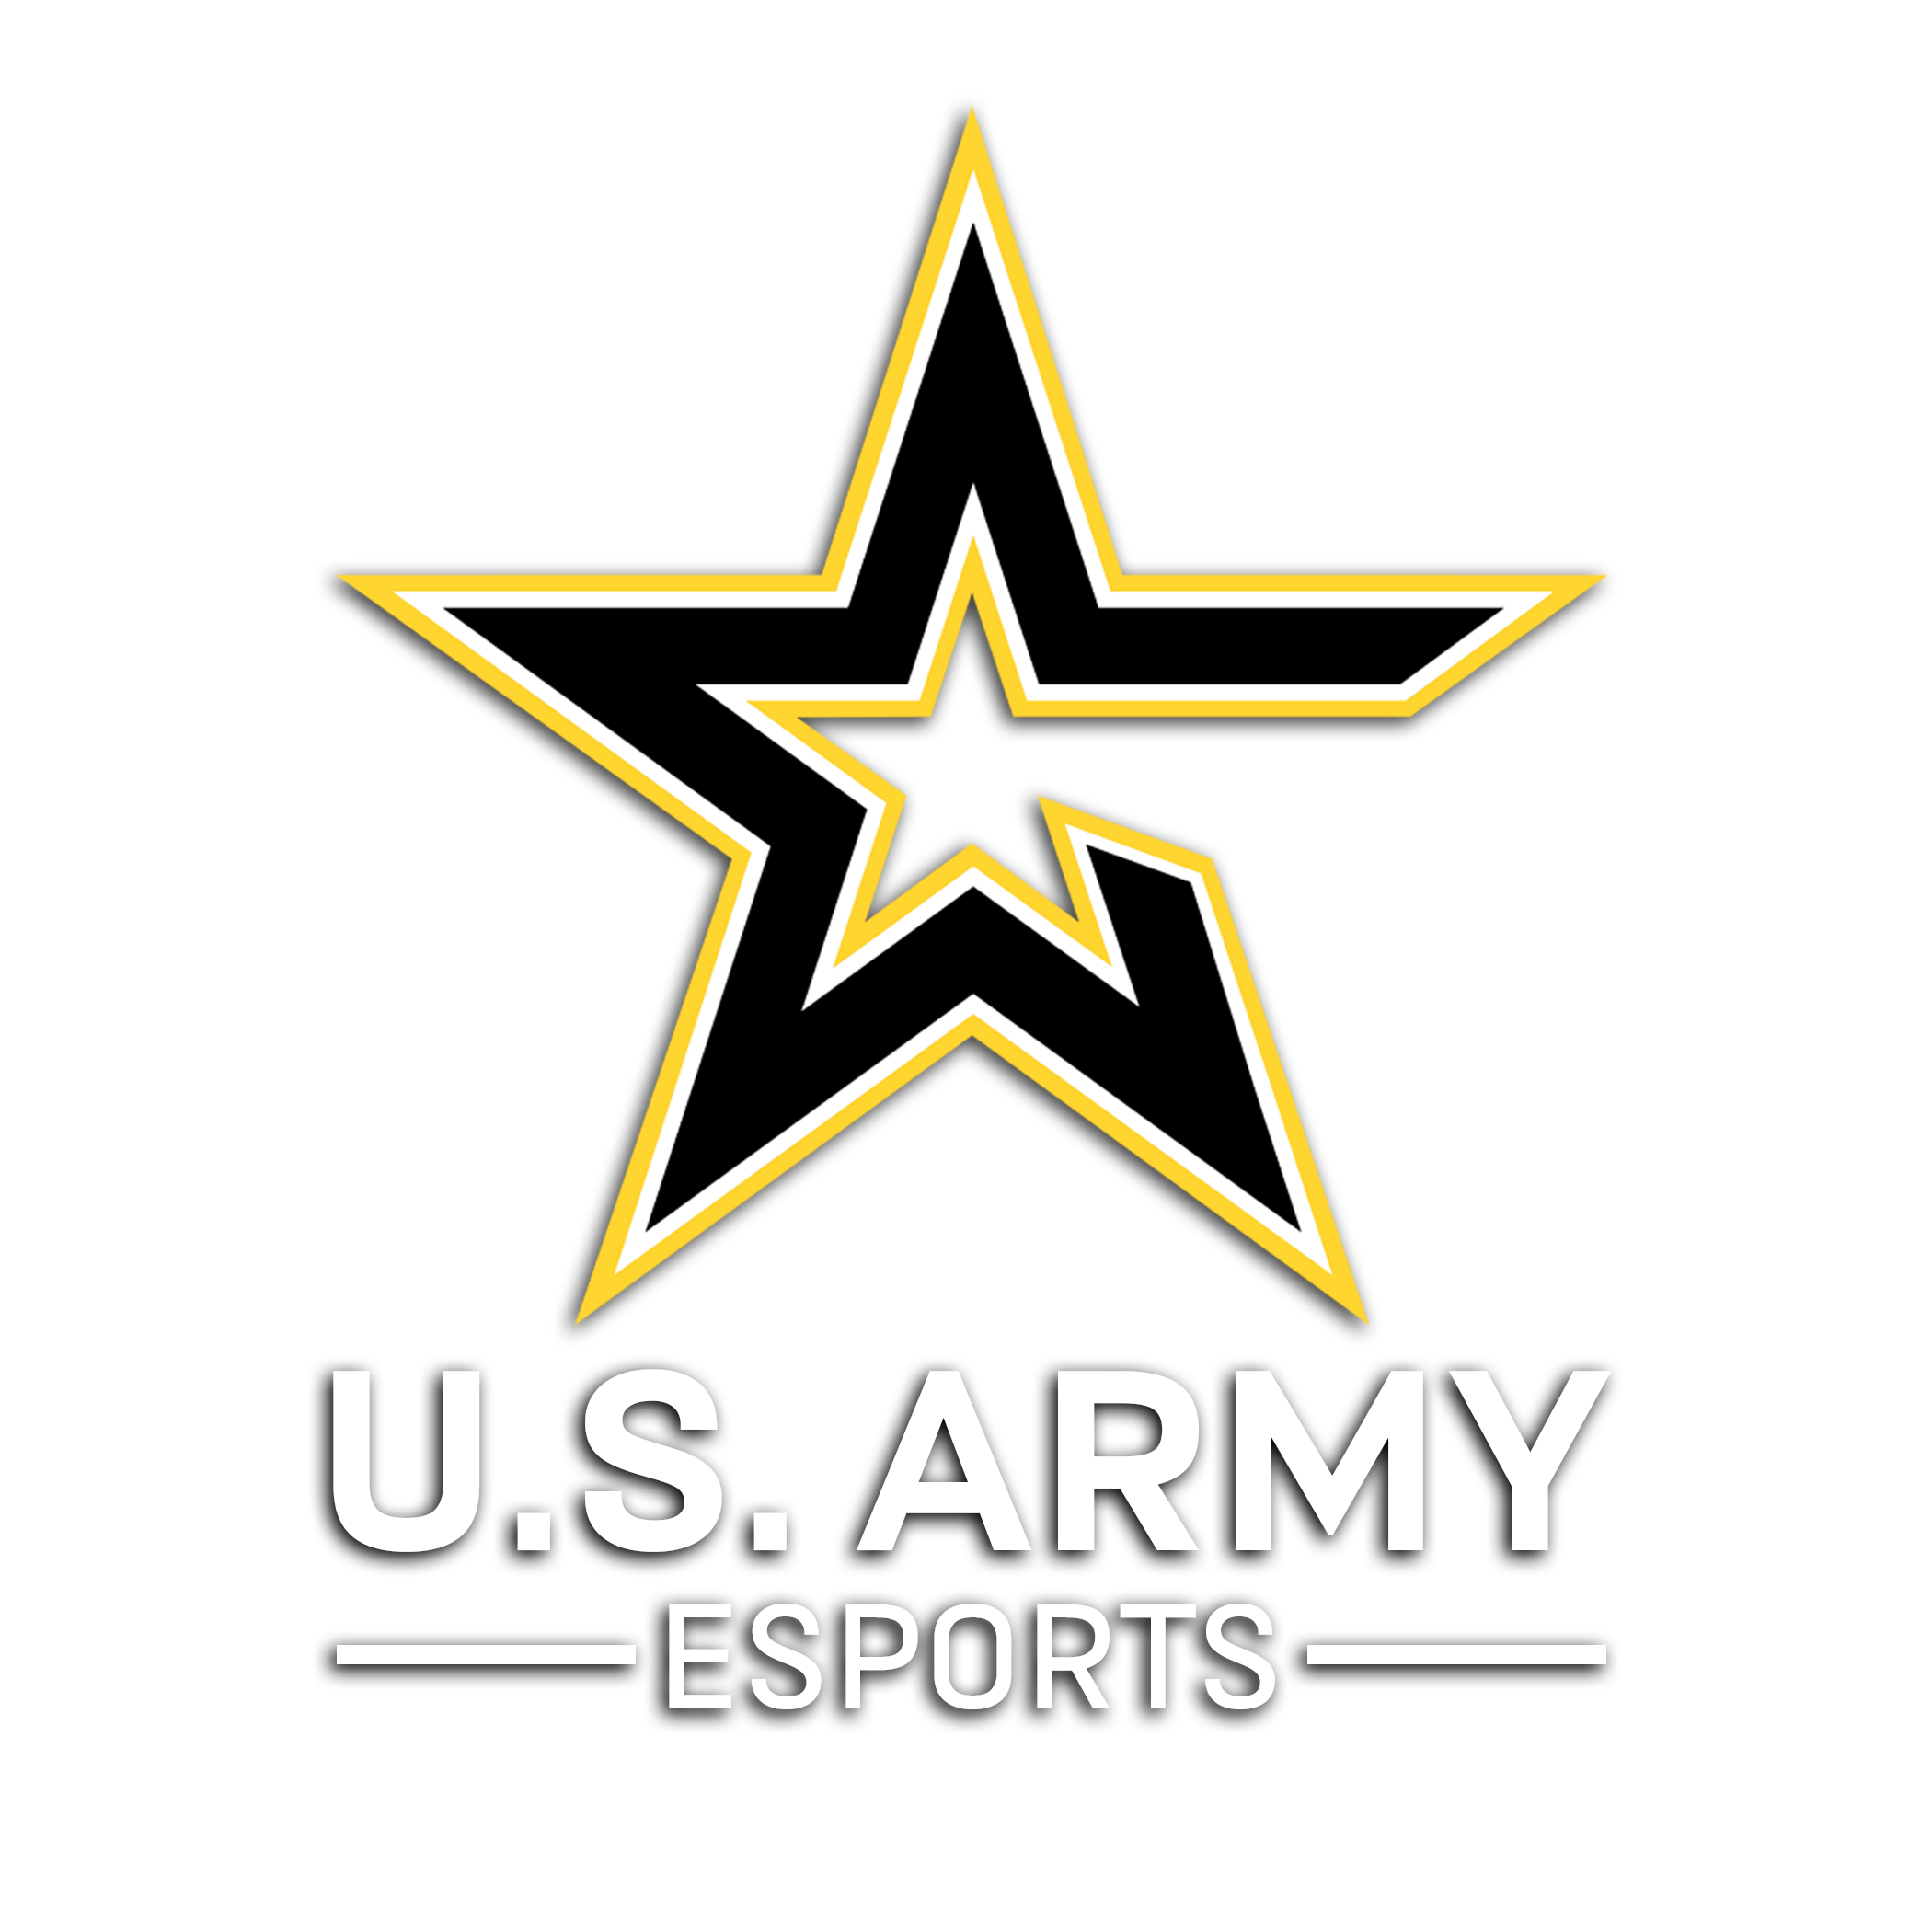 US Army Esports RL (B)'s logo